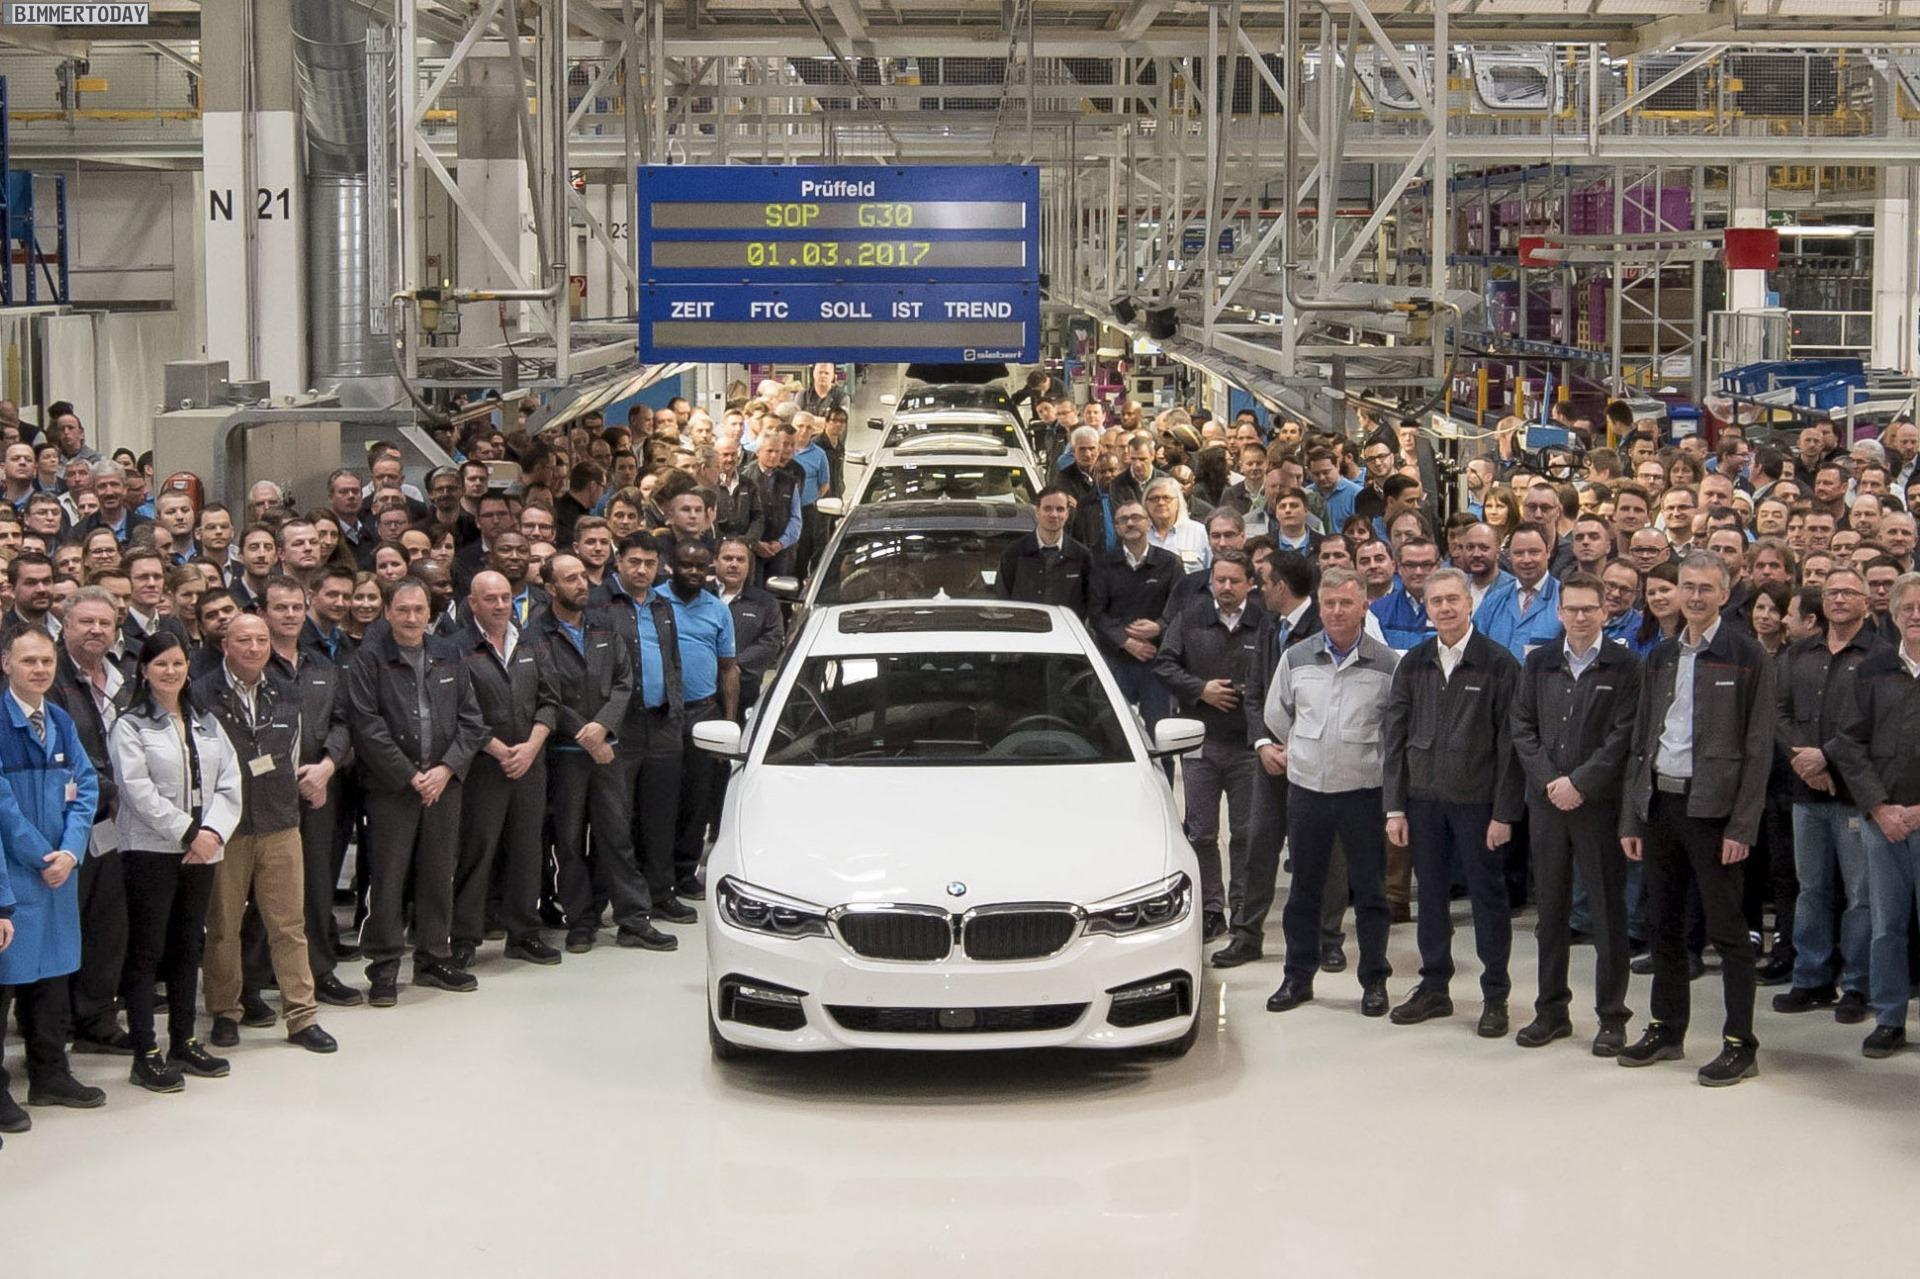 BMW Sere 5 G30 - Produzione Magna Steyr, Graz in Austria